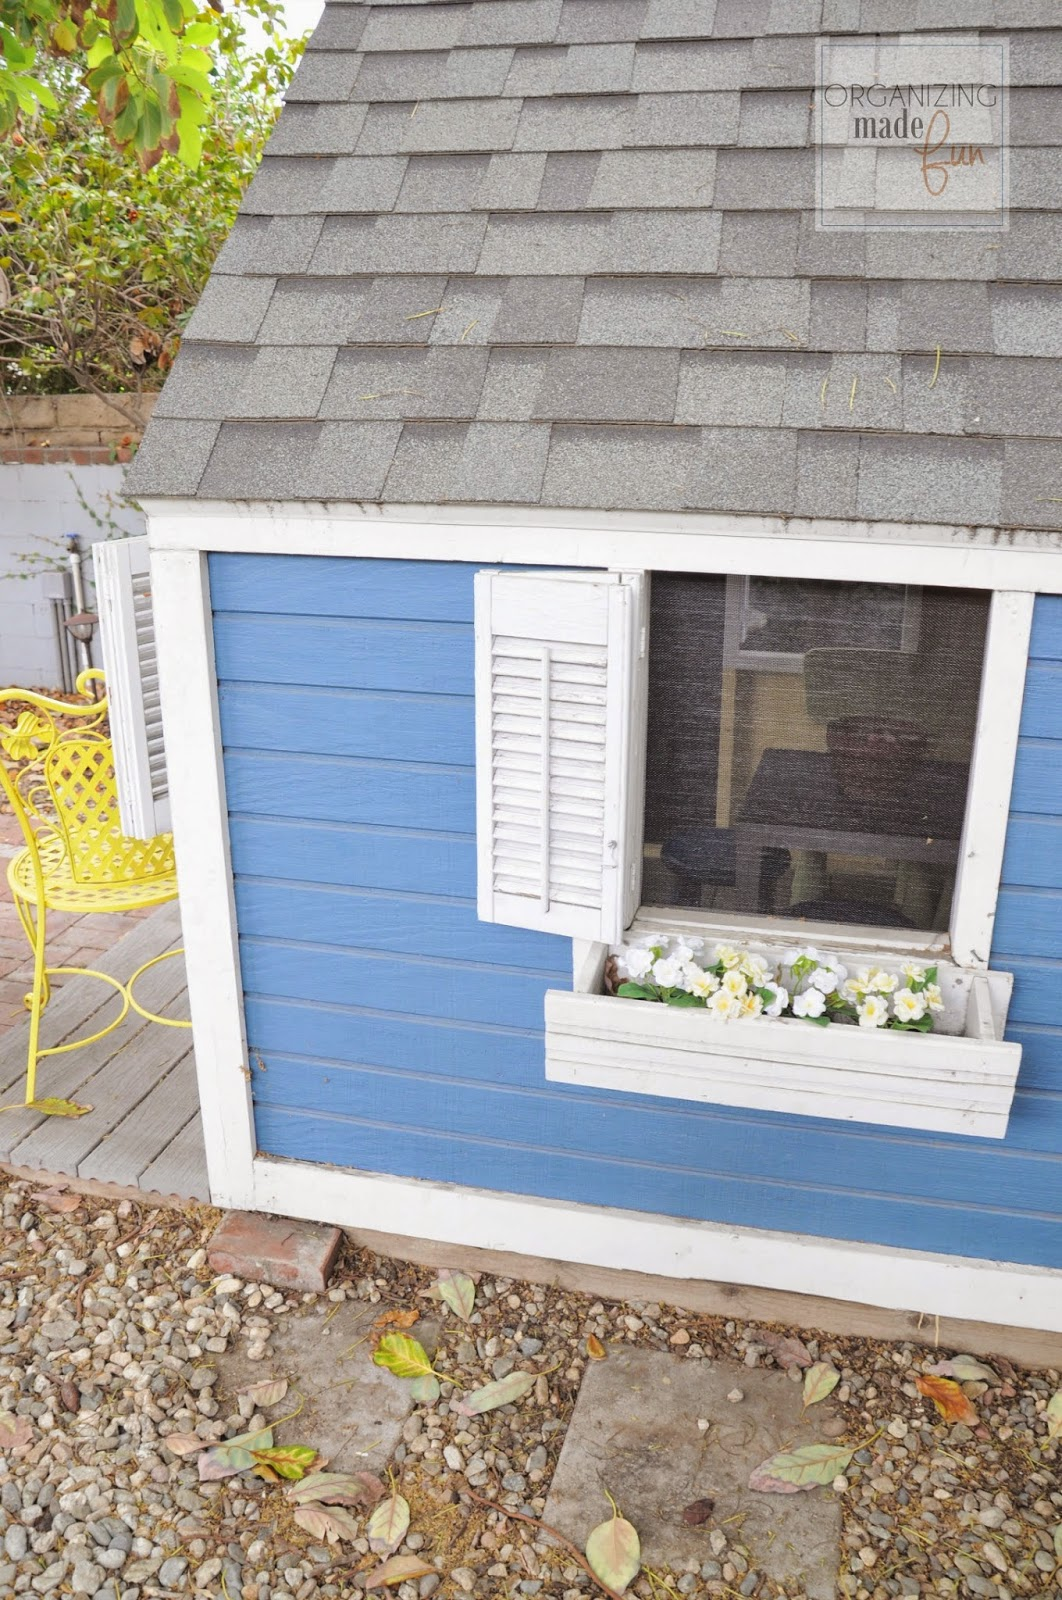 New screening on the playhouse windows :: OrganizingMadeFun.com